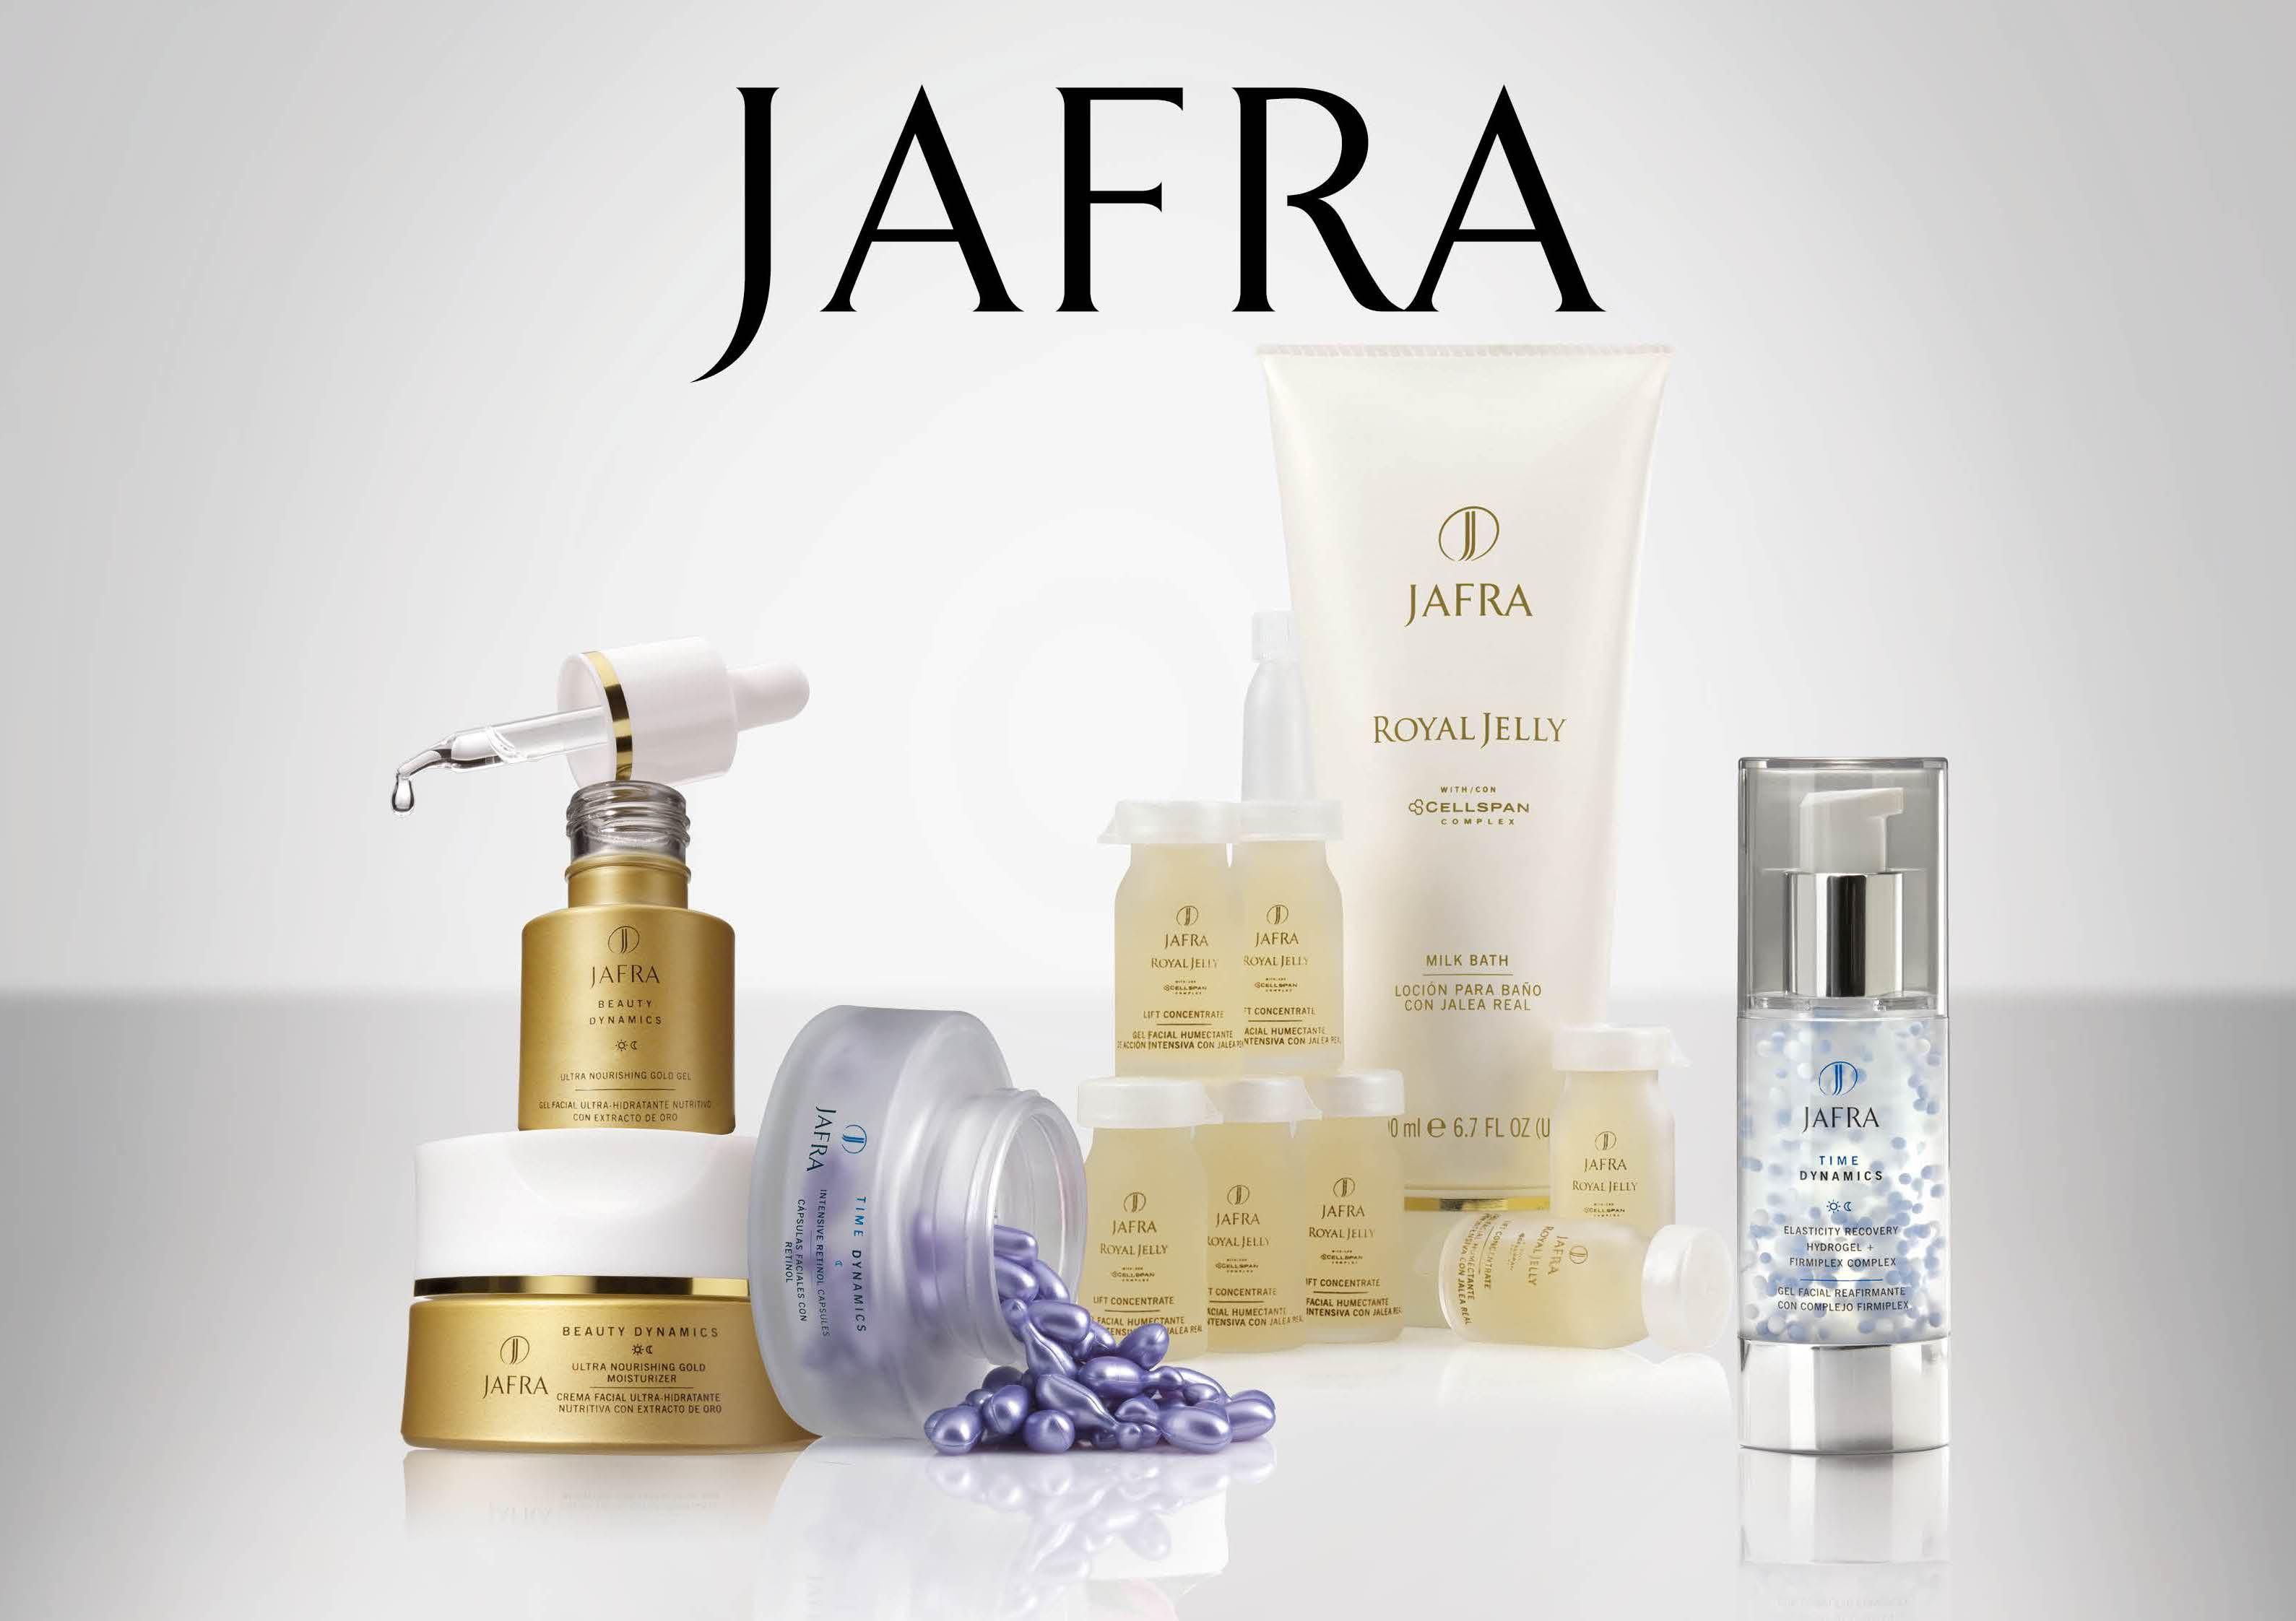 "#RoyalJelly #qualityskincare   ""JAFRA COSMETICS"" MI"